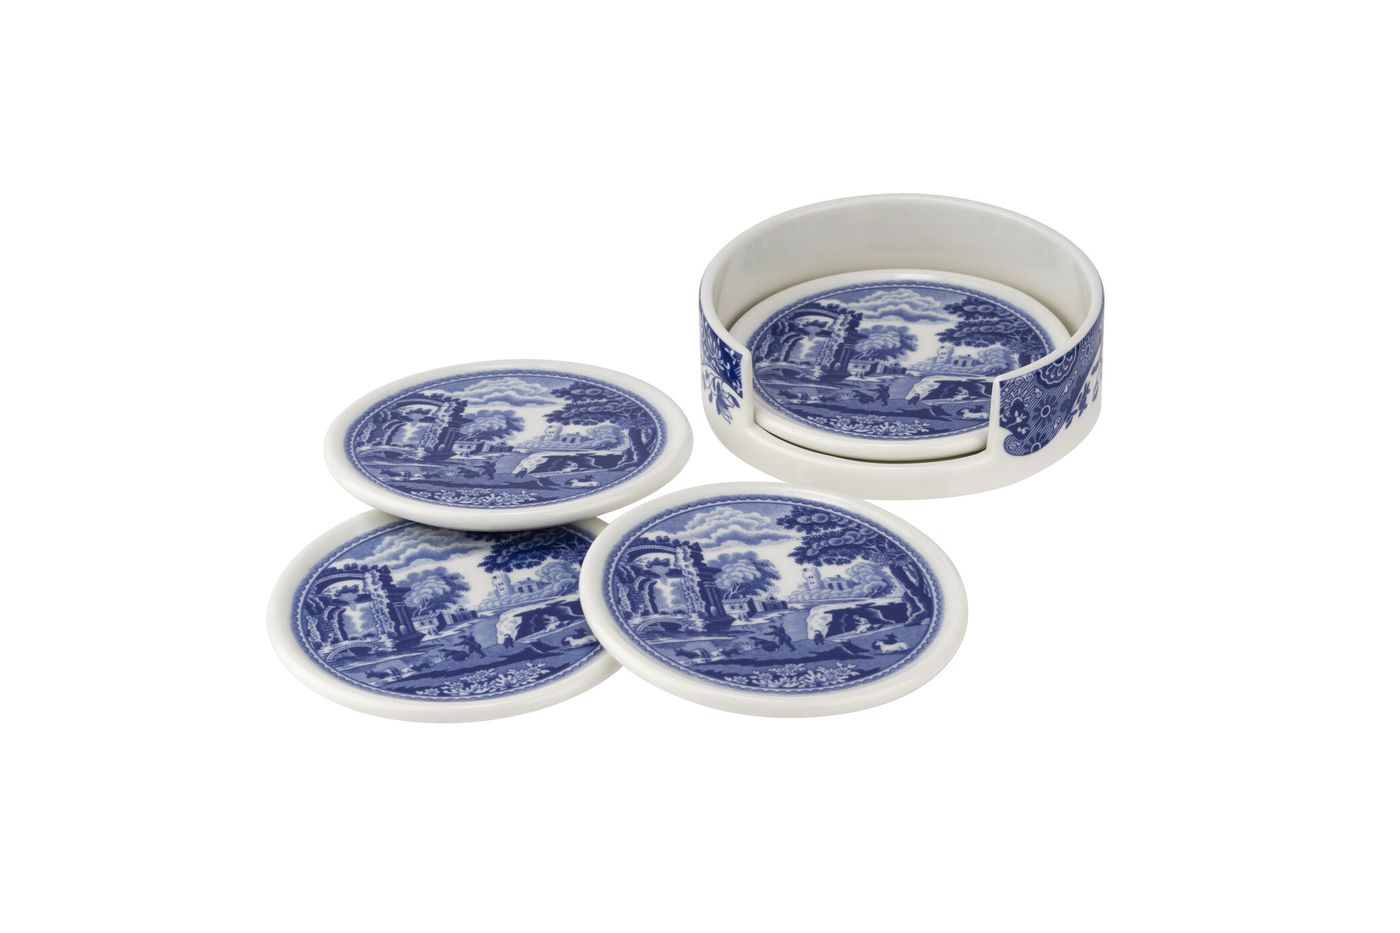 Spode Blue Italian Ceramic Coasters with Holder Set of 4 coasters thumb 1